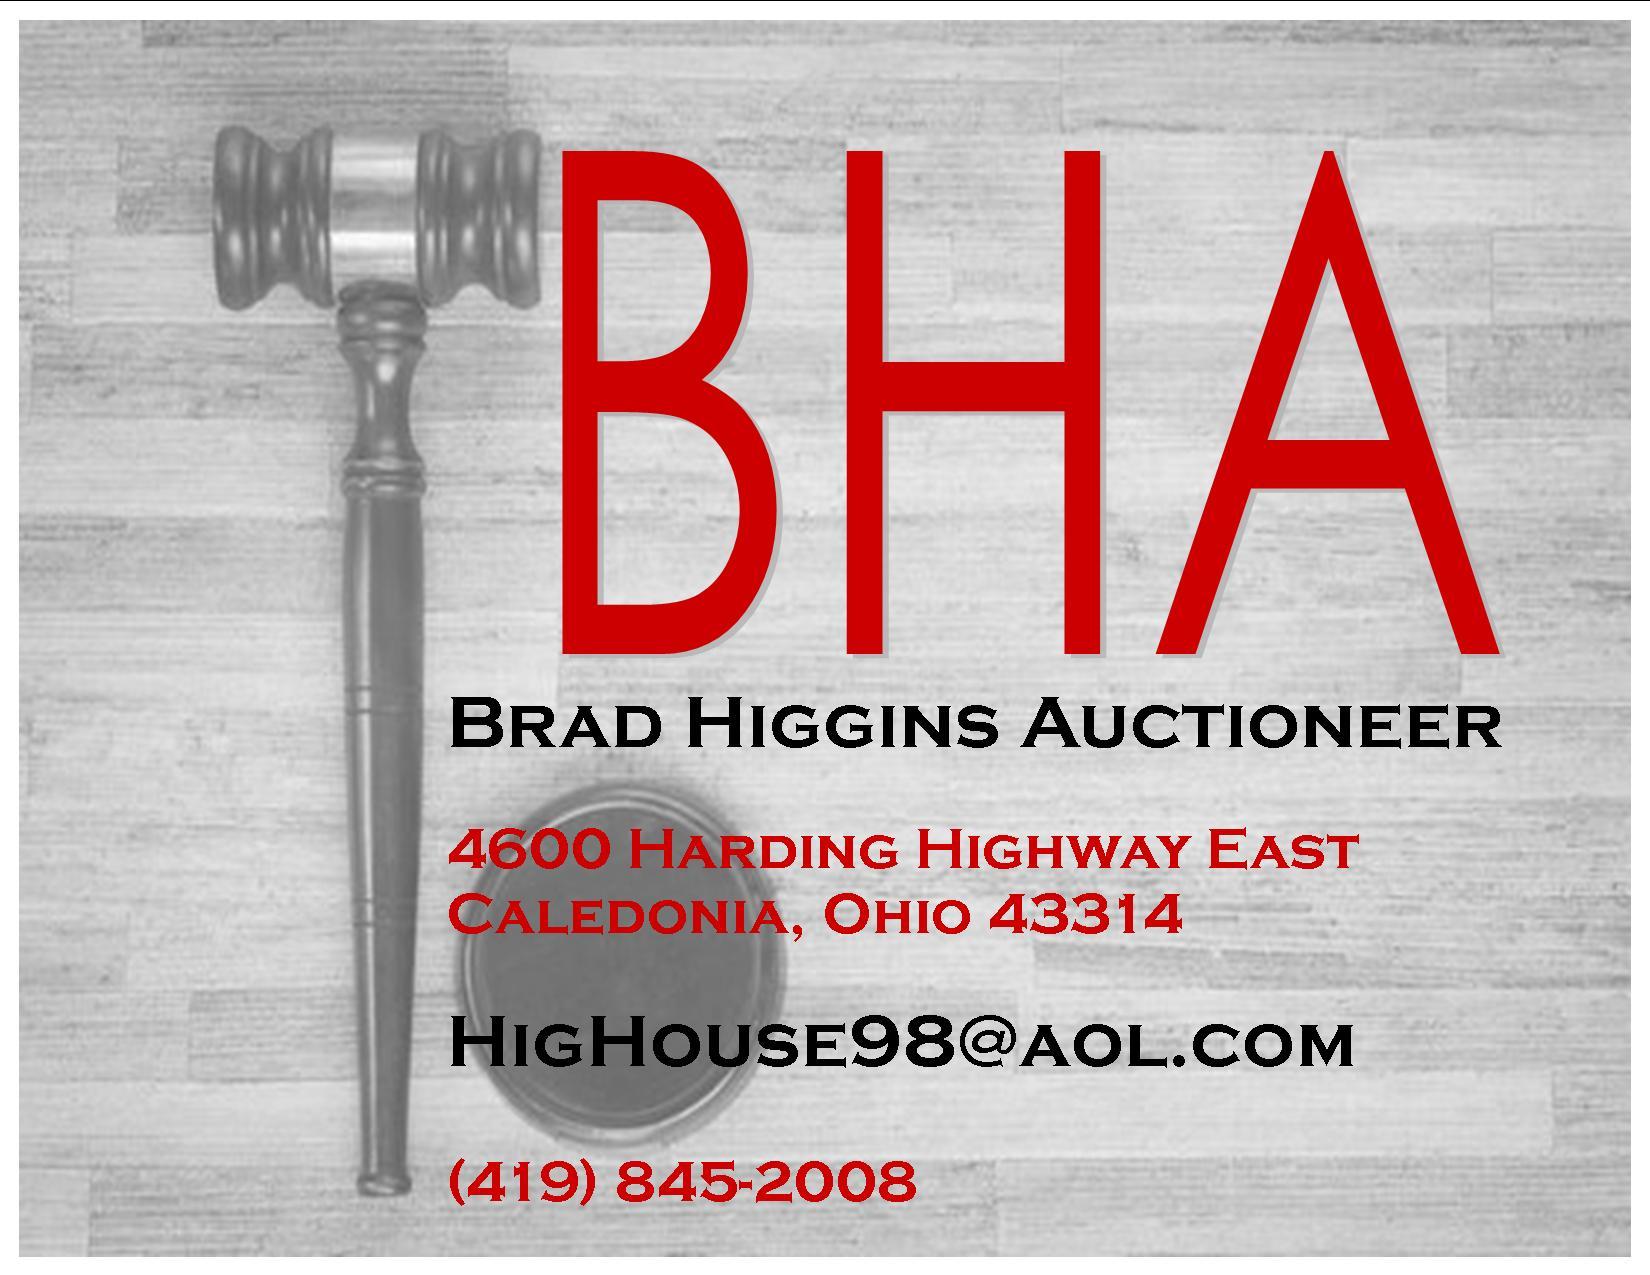 Brad Higgins Auctioneer